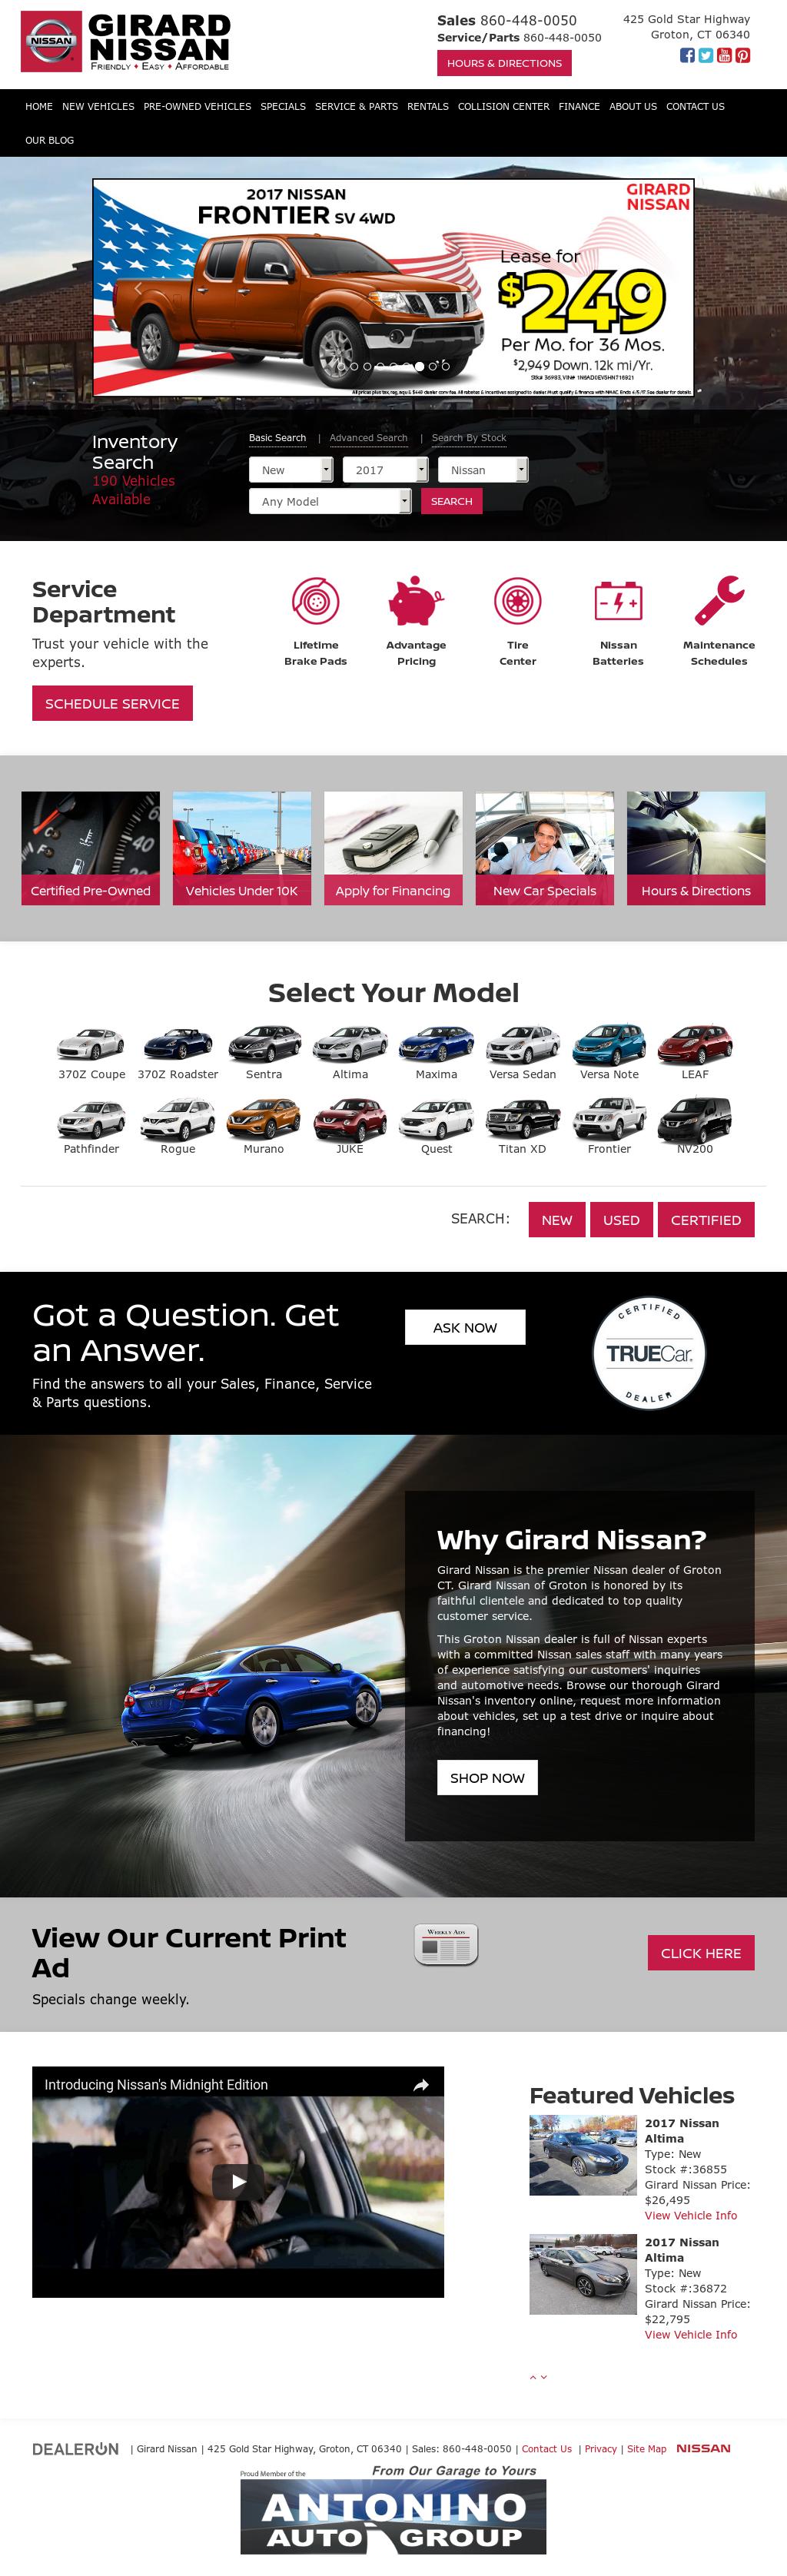 Girard Nissan Website History